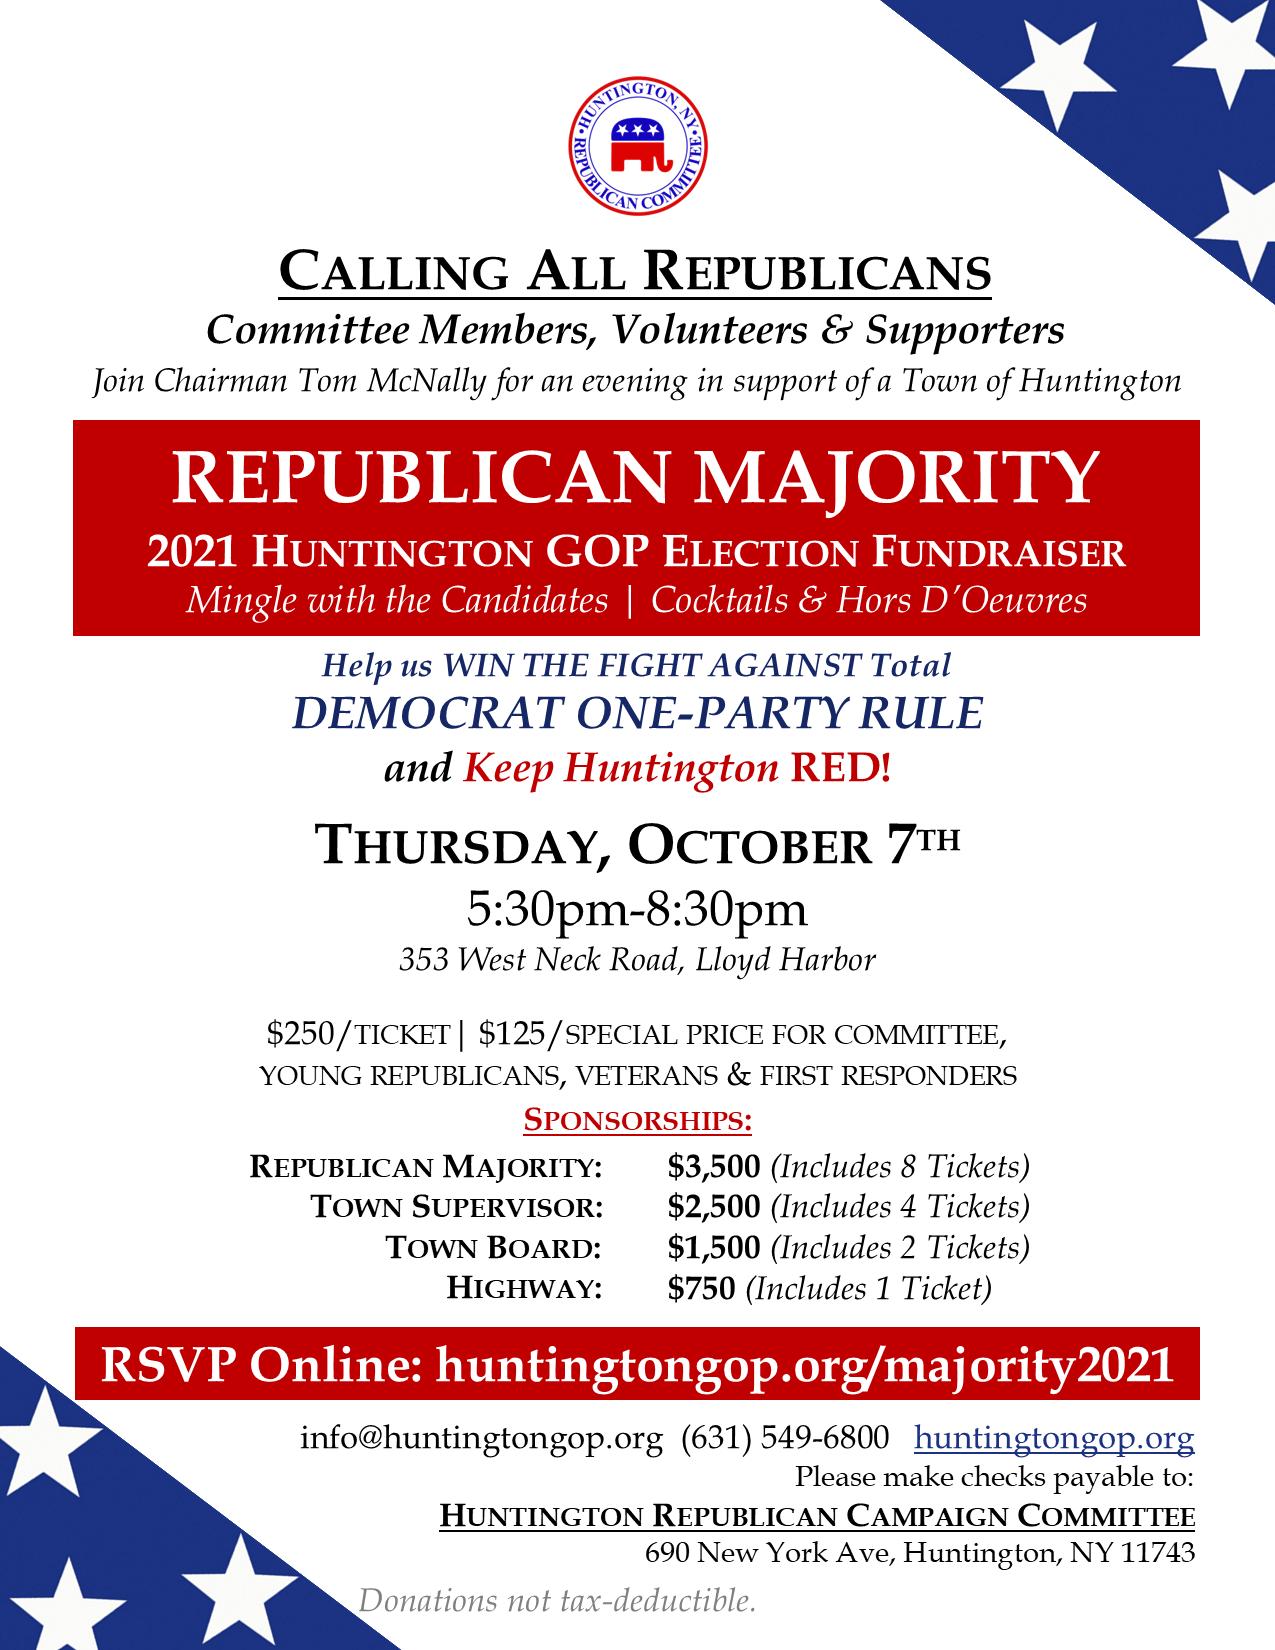 RepublicanMajority2021.png